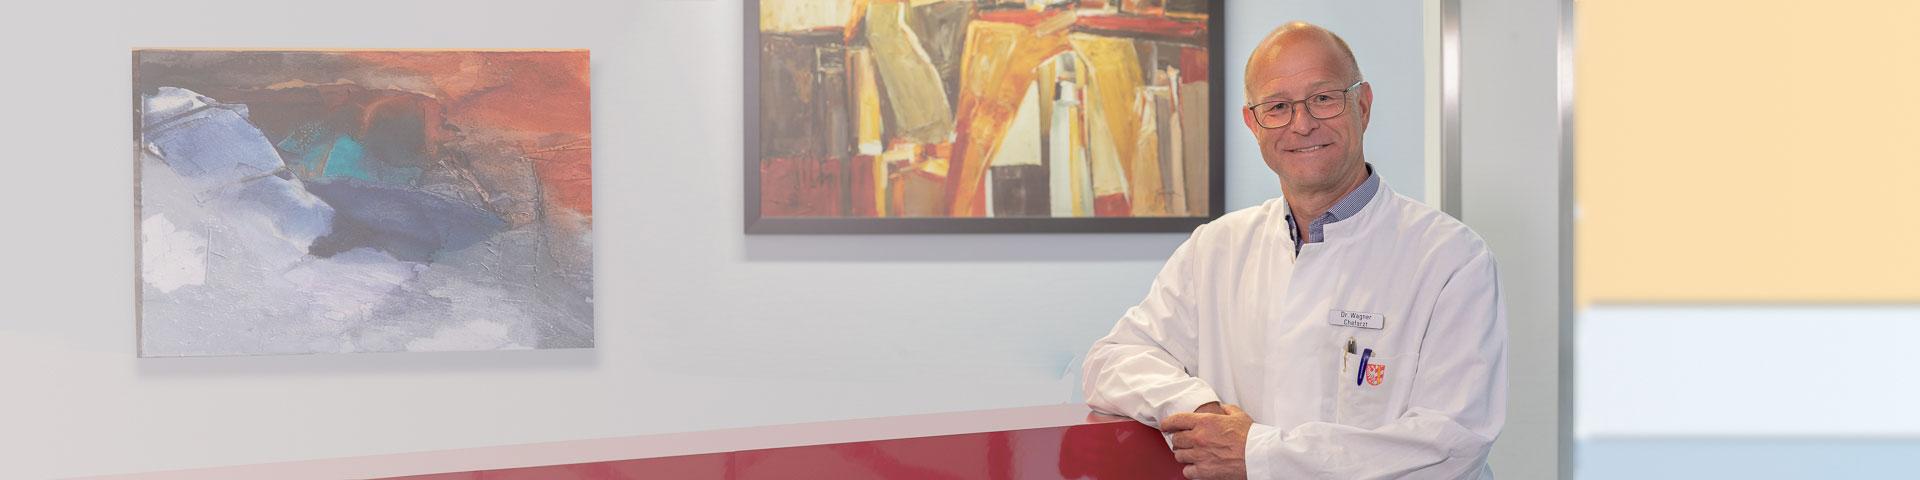 Dr. Wagner, Chefarzt Gelenkzentrum Krumbach, Schwaben